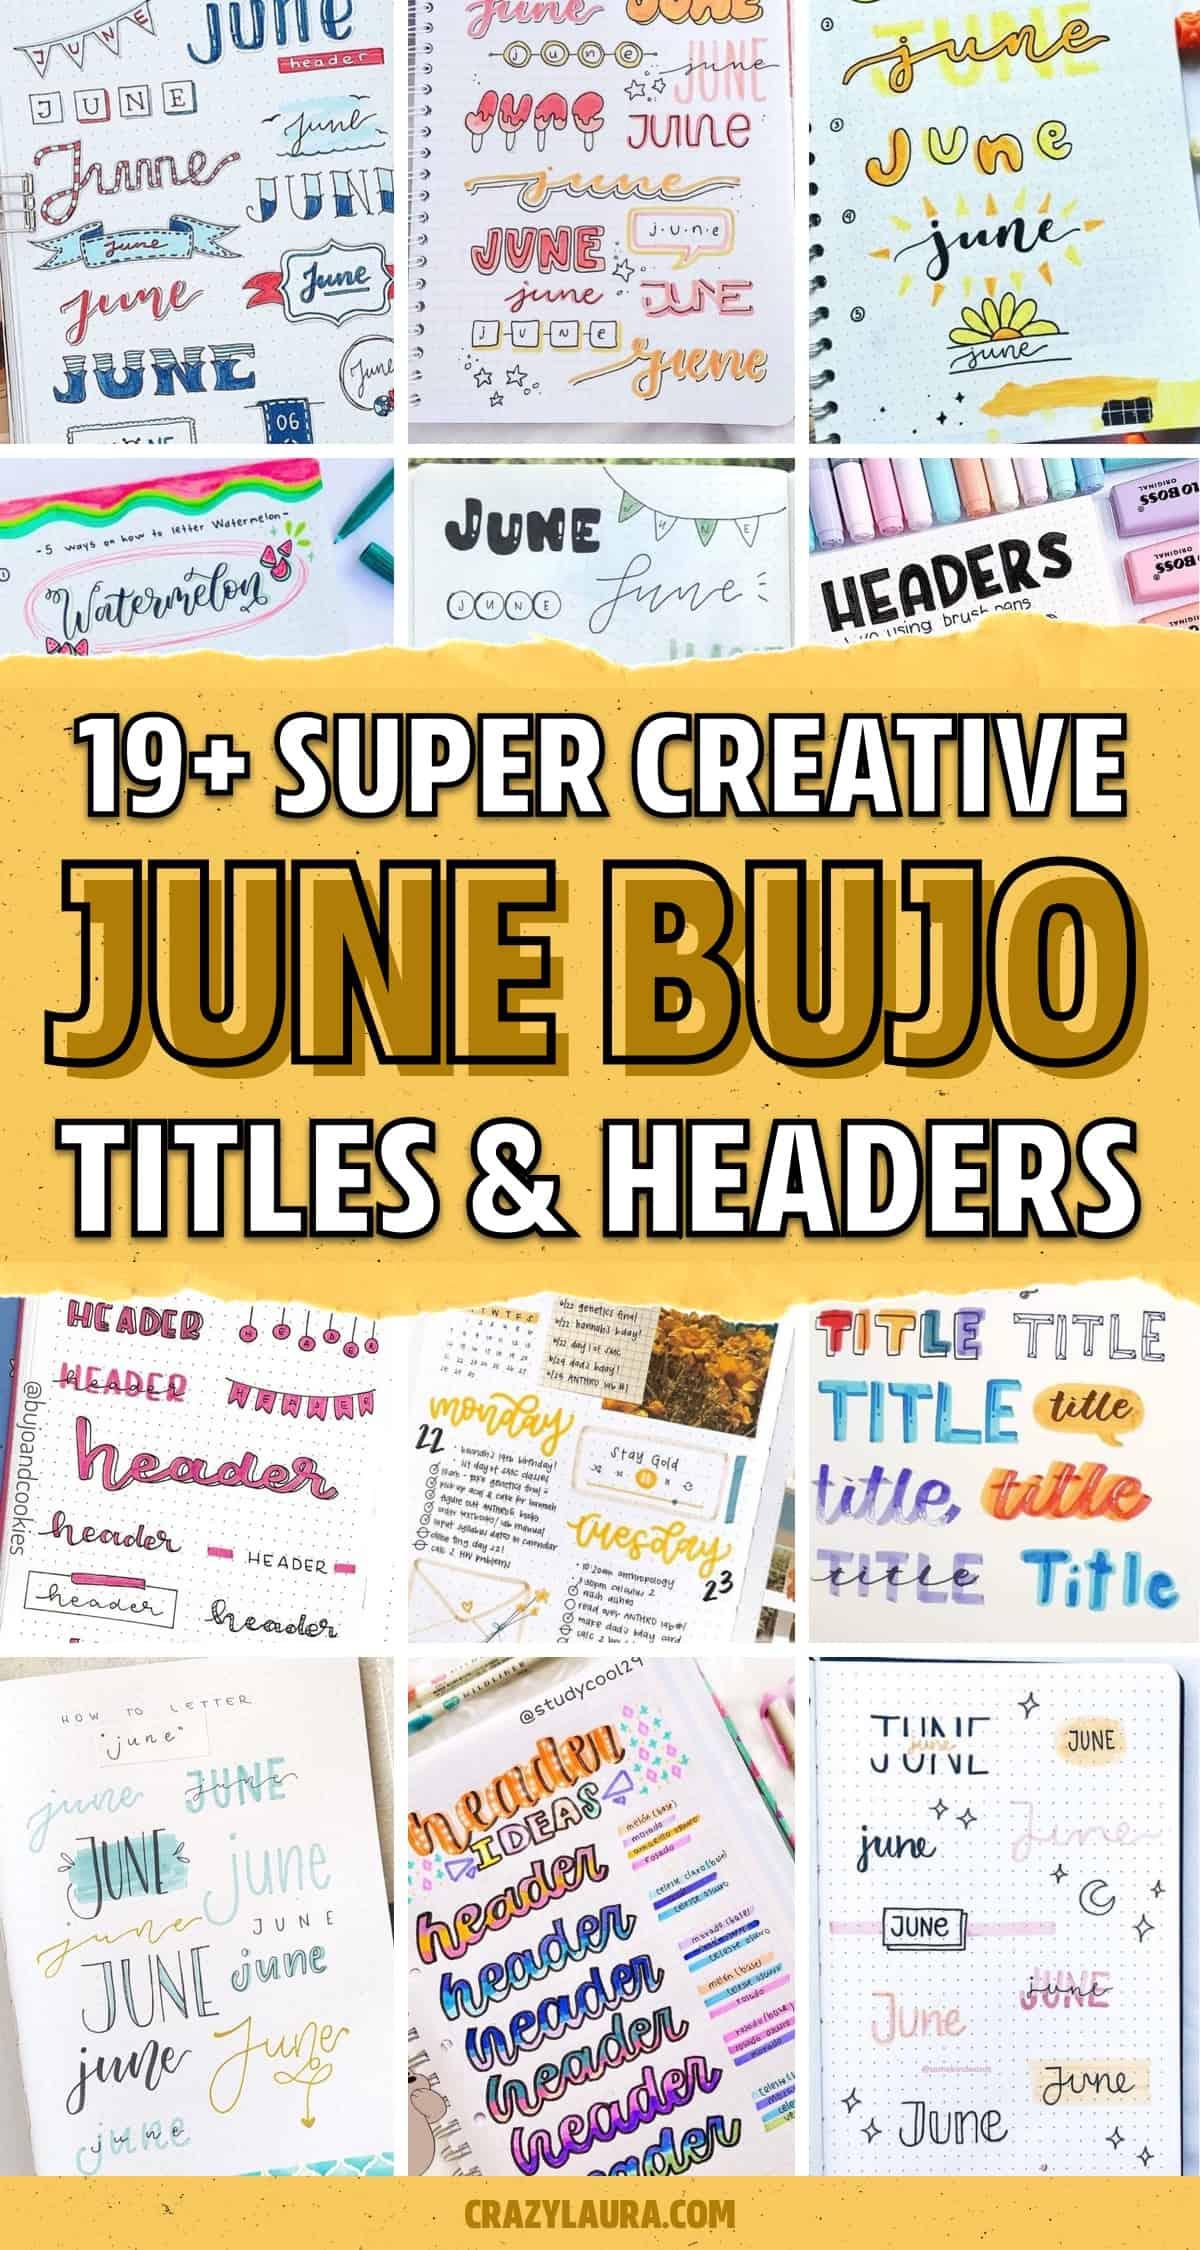 june dot journal title lettering examples